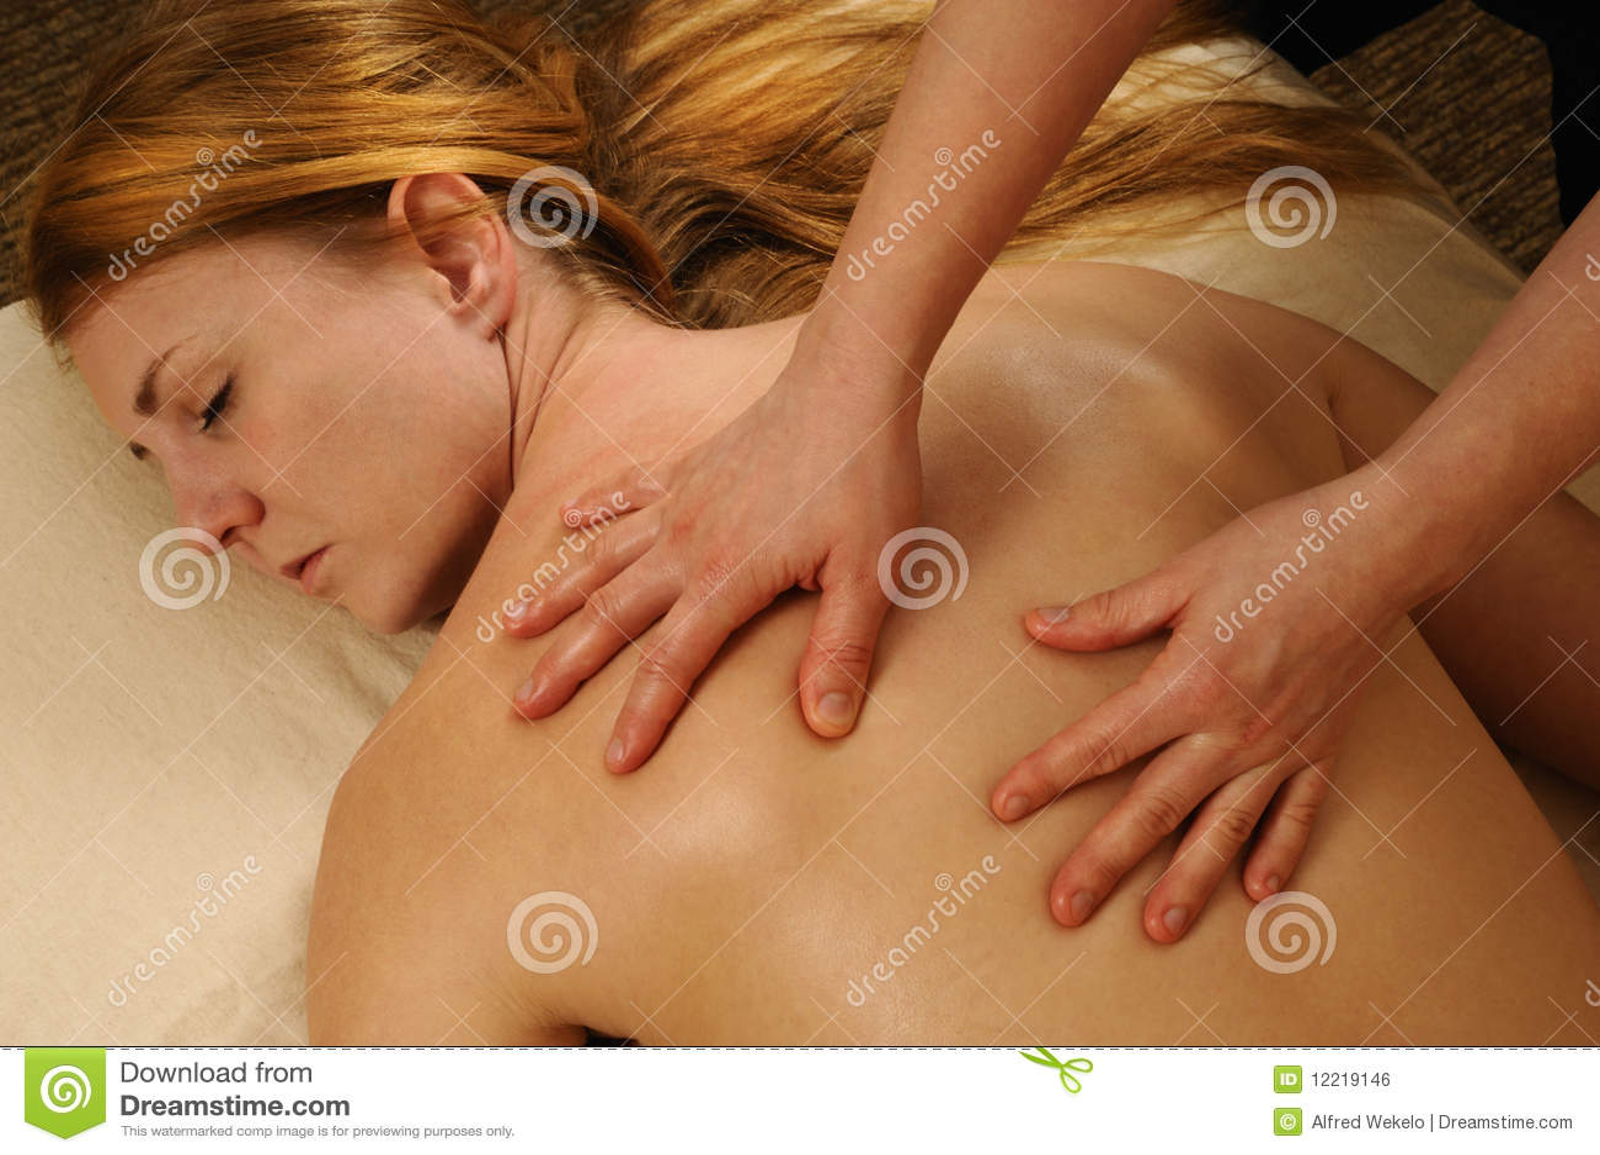 girls full body massage